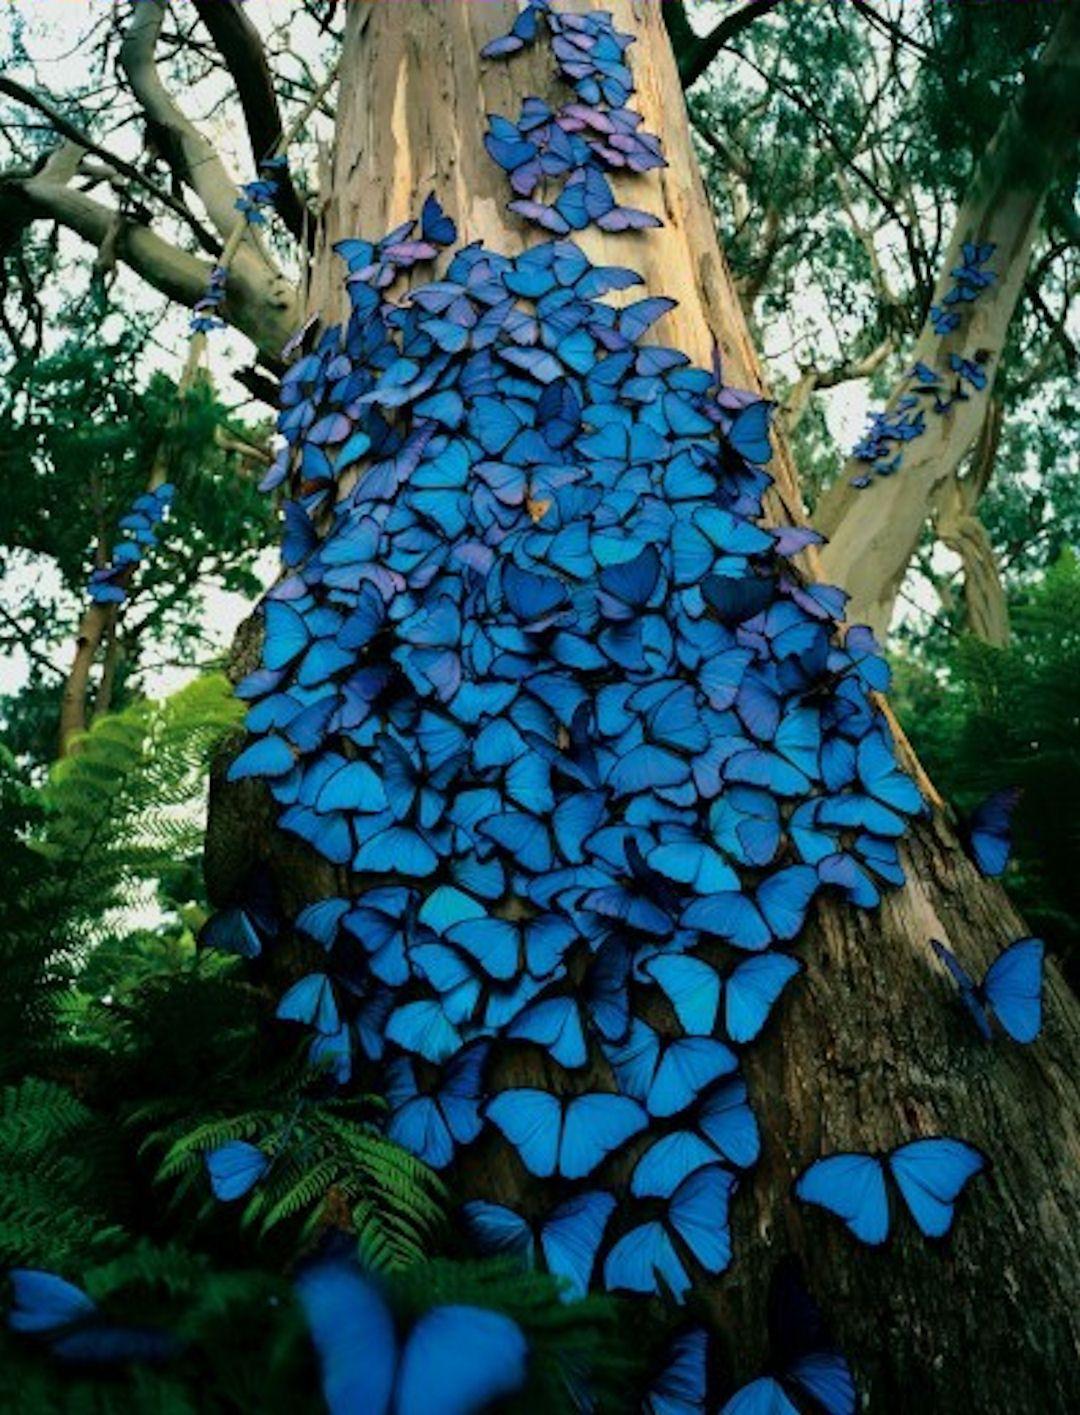 Swarm Of Butterflies Tumblr Blue Morpho Butterfly ...